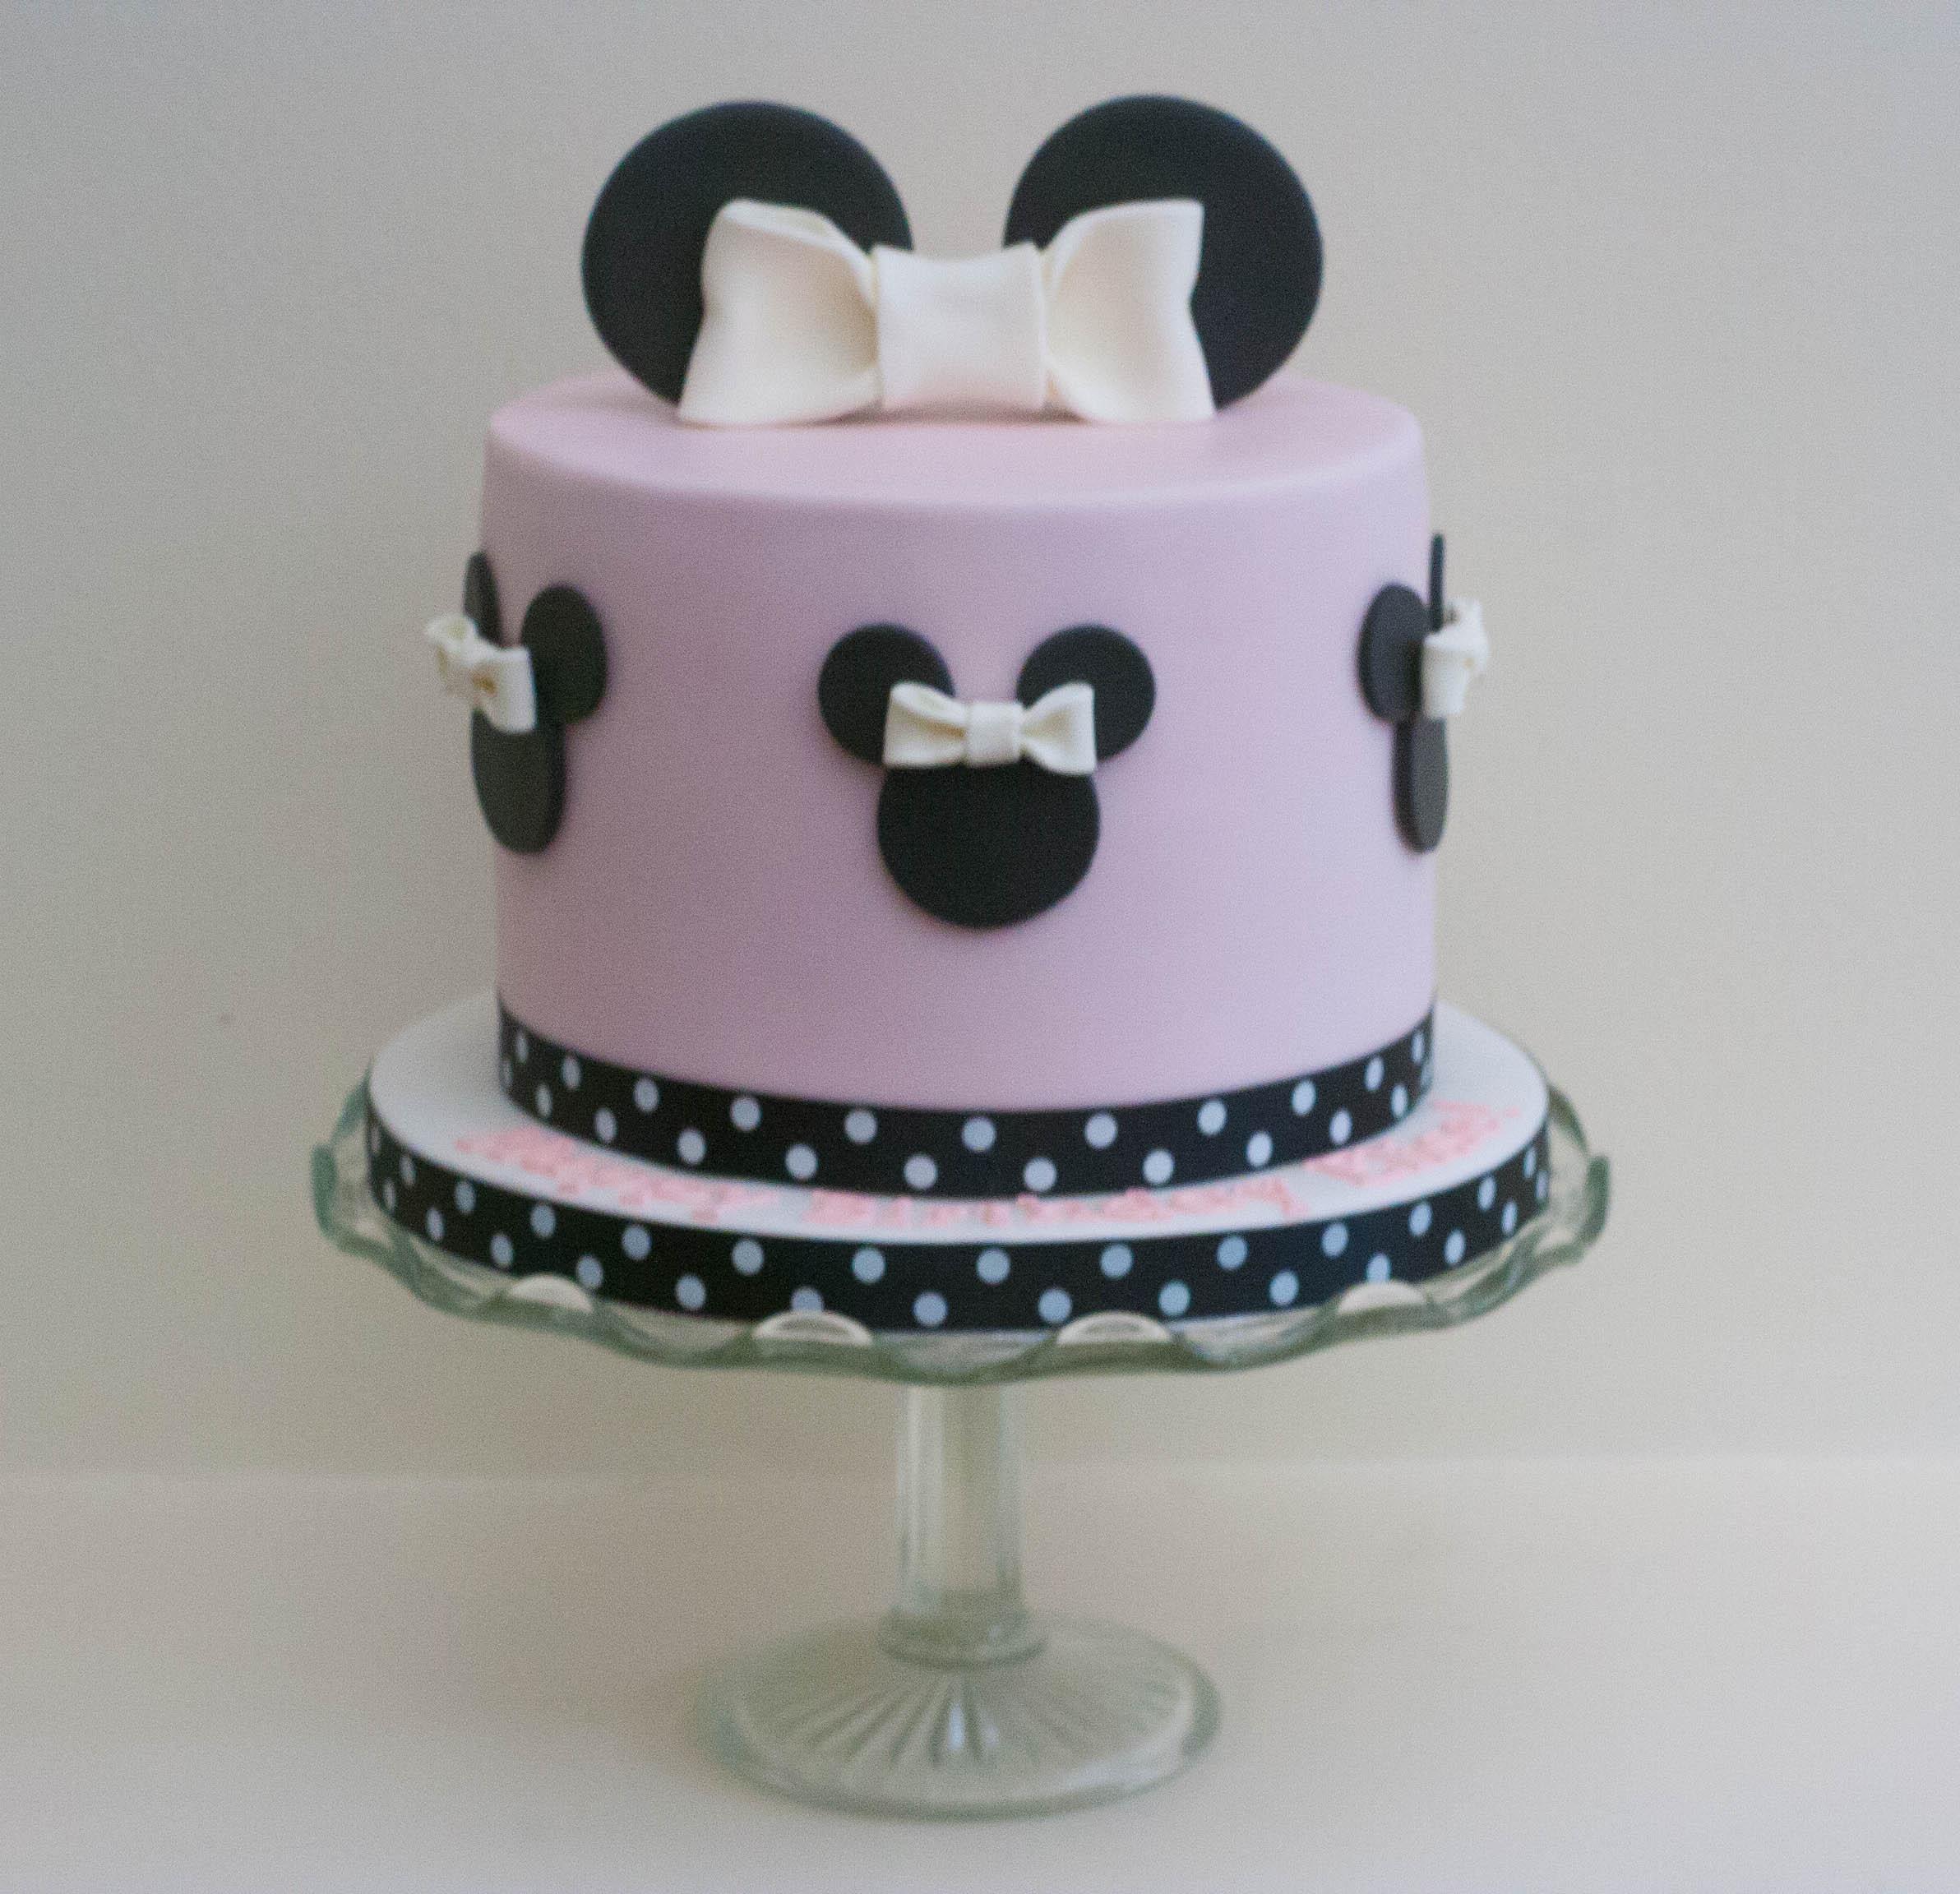 Minnie Mouse cake vegan gf